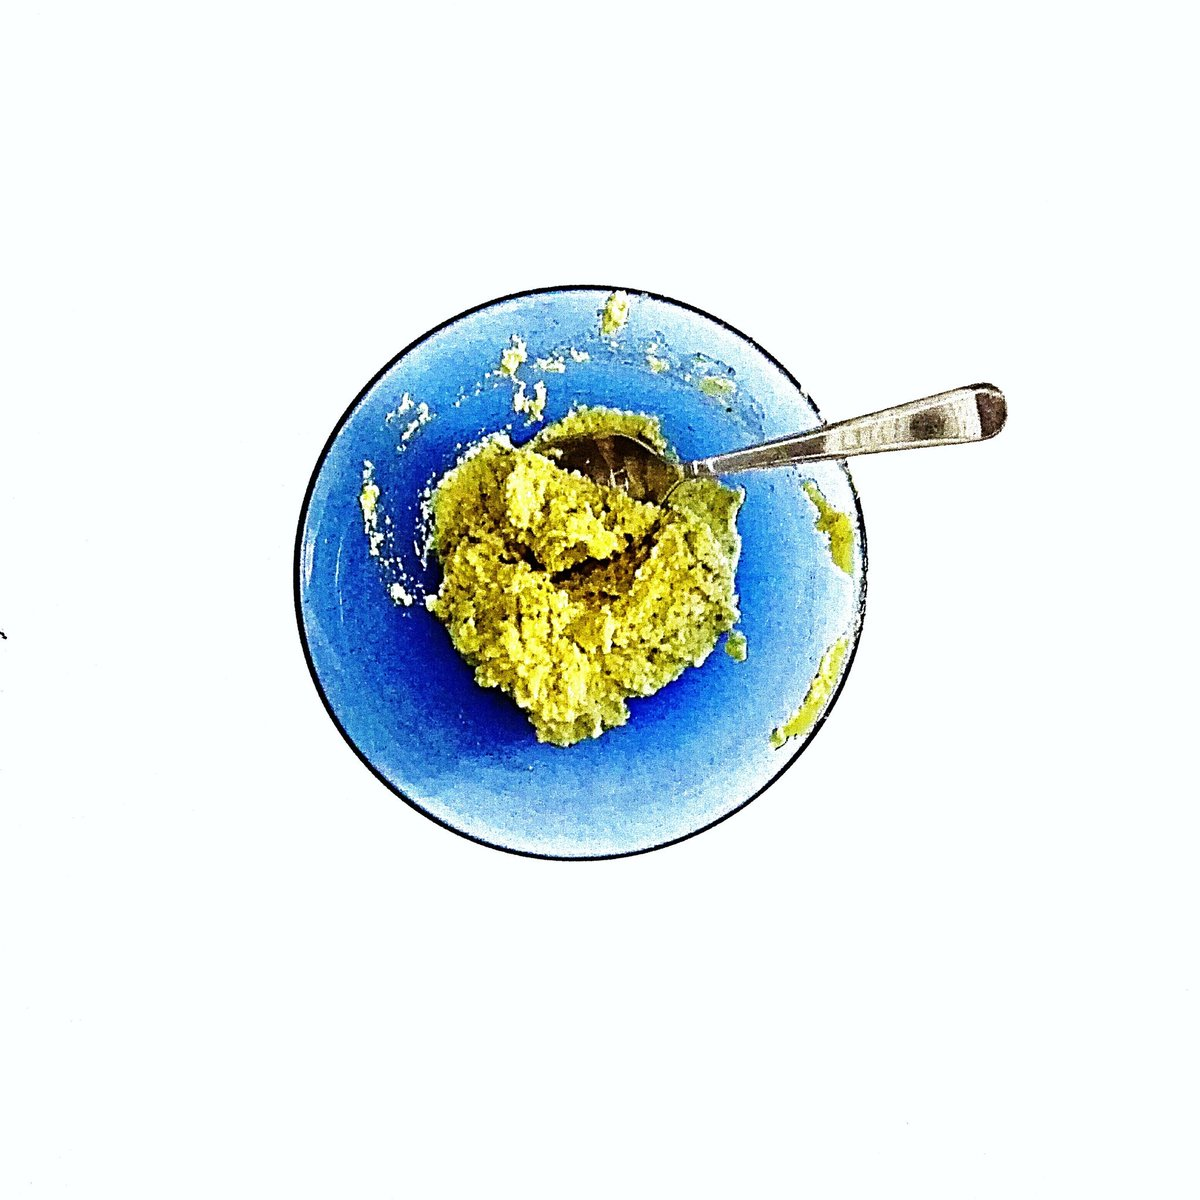 New post on my blog  http:// bit.ly/2dWOWUX  &nbsp;   #Vegan cheese cream basil pesto flavour @BBlogRT @BlogLoveRT @Bloggeration_ #HealthyFood #yummy<br>http://pic.twitter.com/ewmcaZxsCp